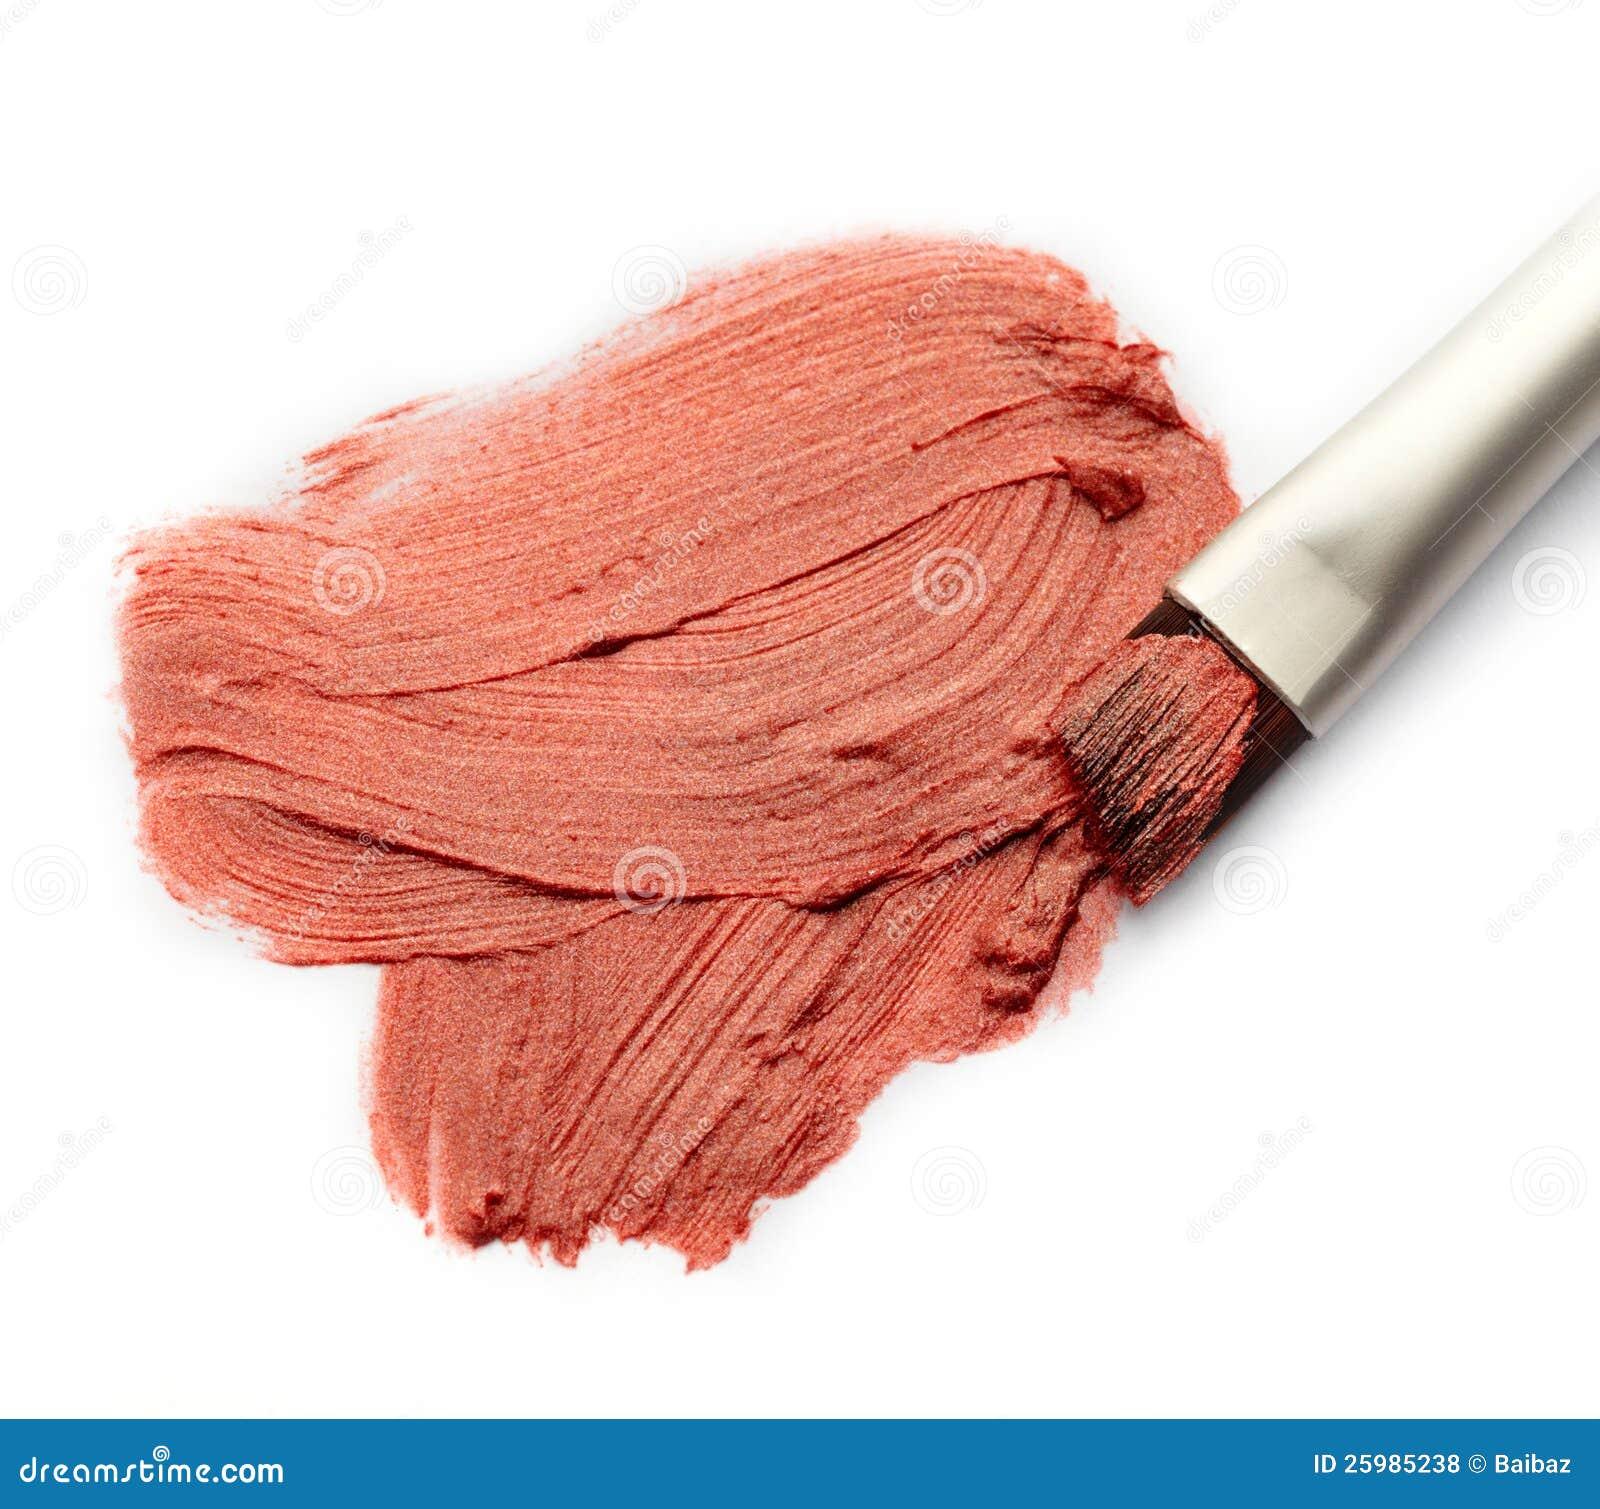 Lipstick Smear Royalty Free Stock Photos - Image: 25985238